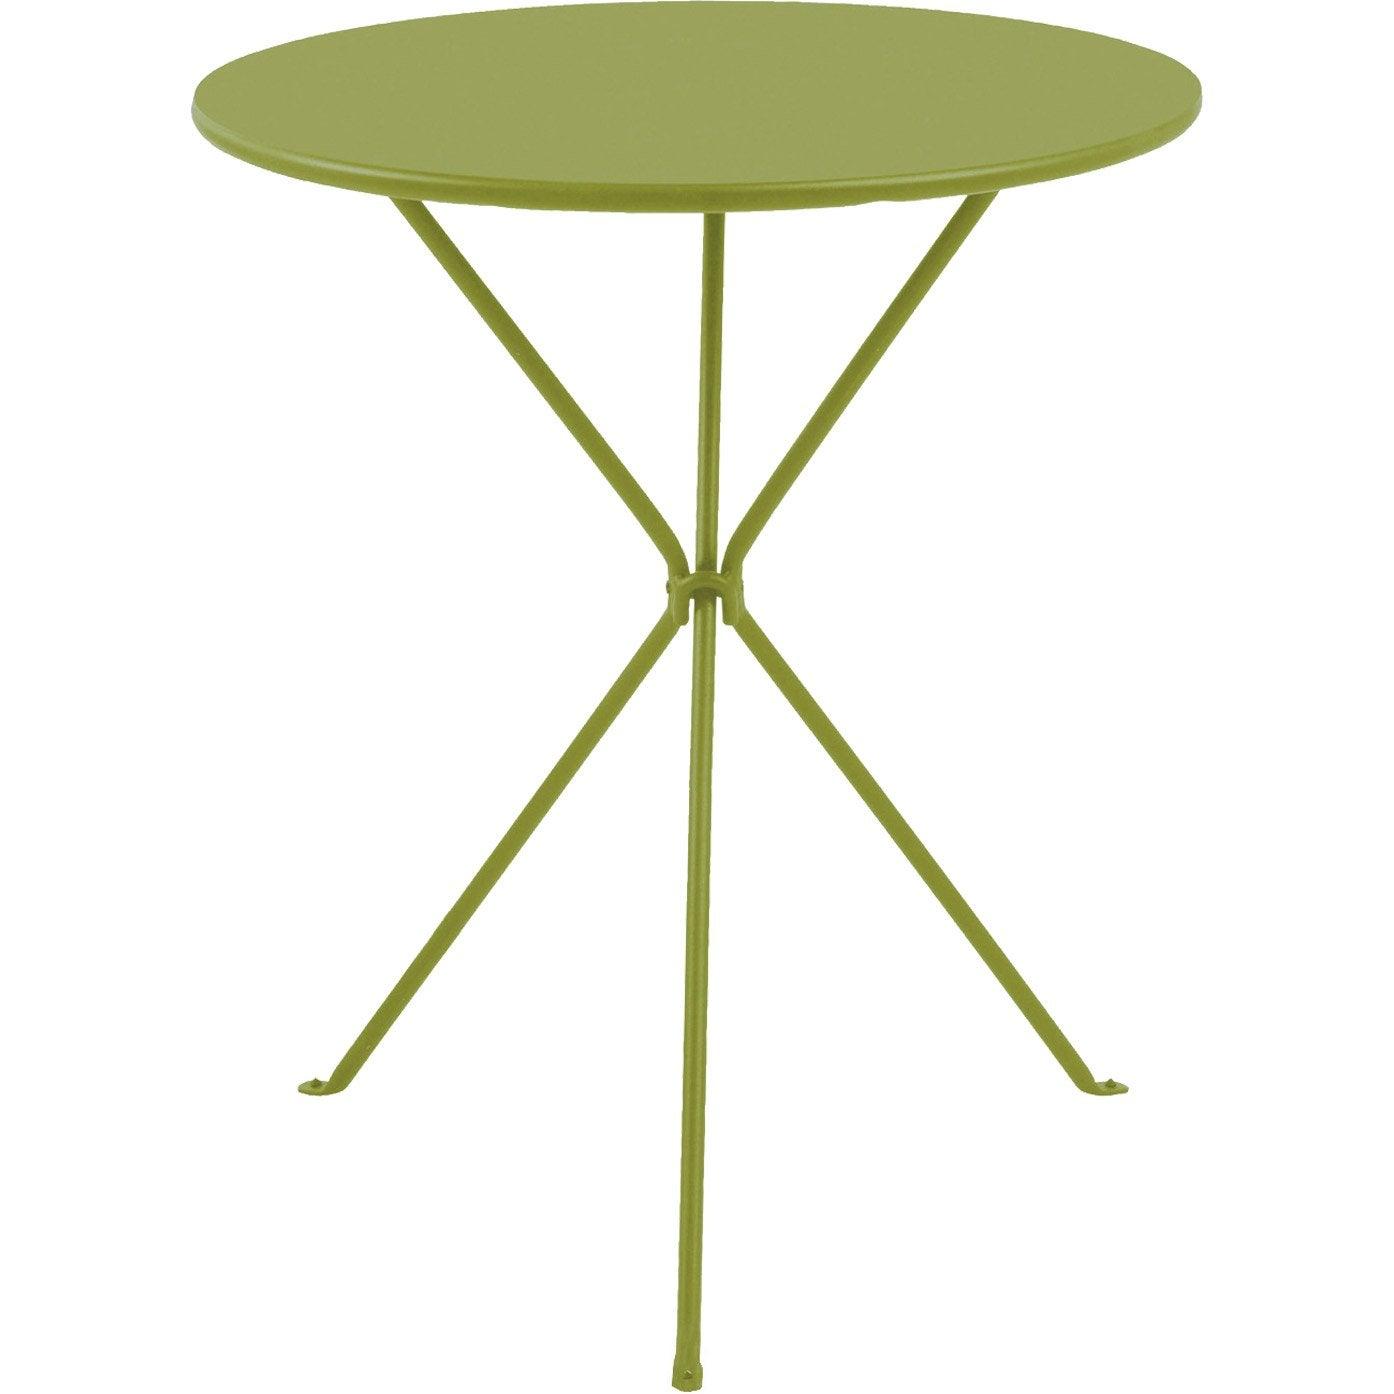 table basse gu ridon ronde vert 2 personnes leroy merlin. Black Bedroom Furniture Sets. Home Design Ideas